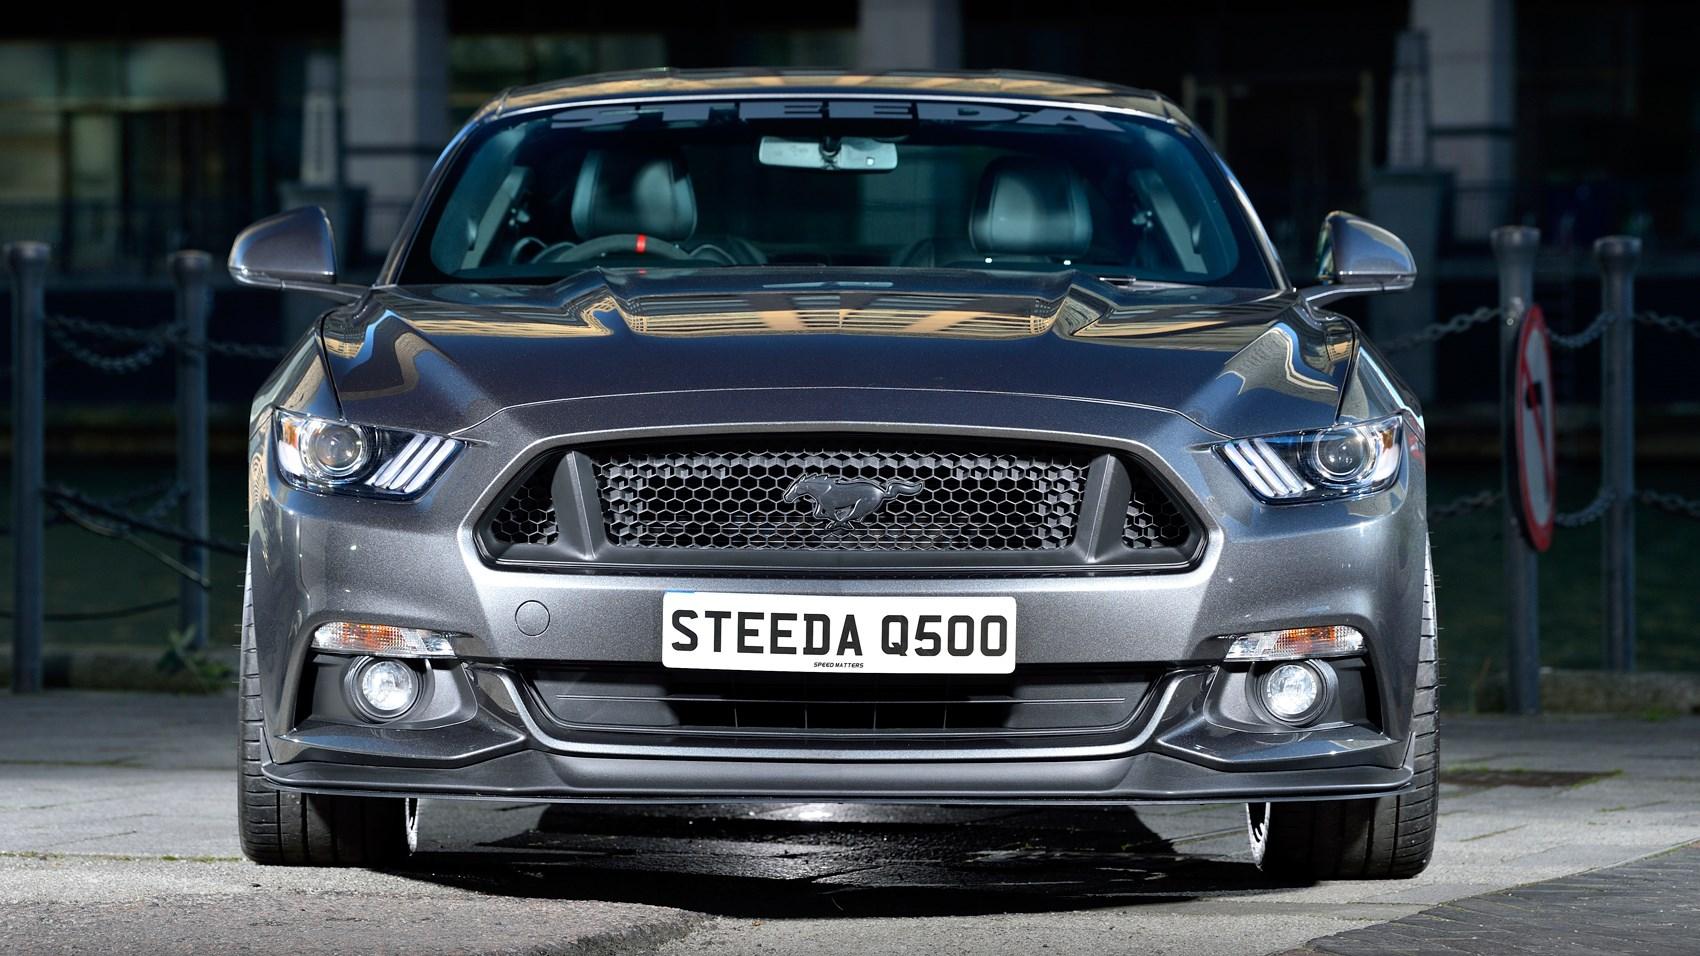 Steeda Q500 front